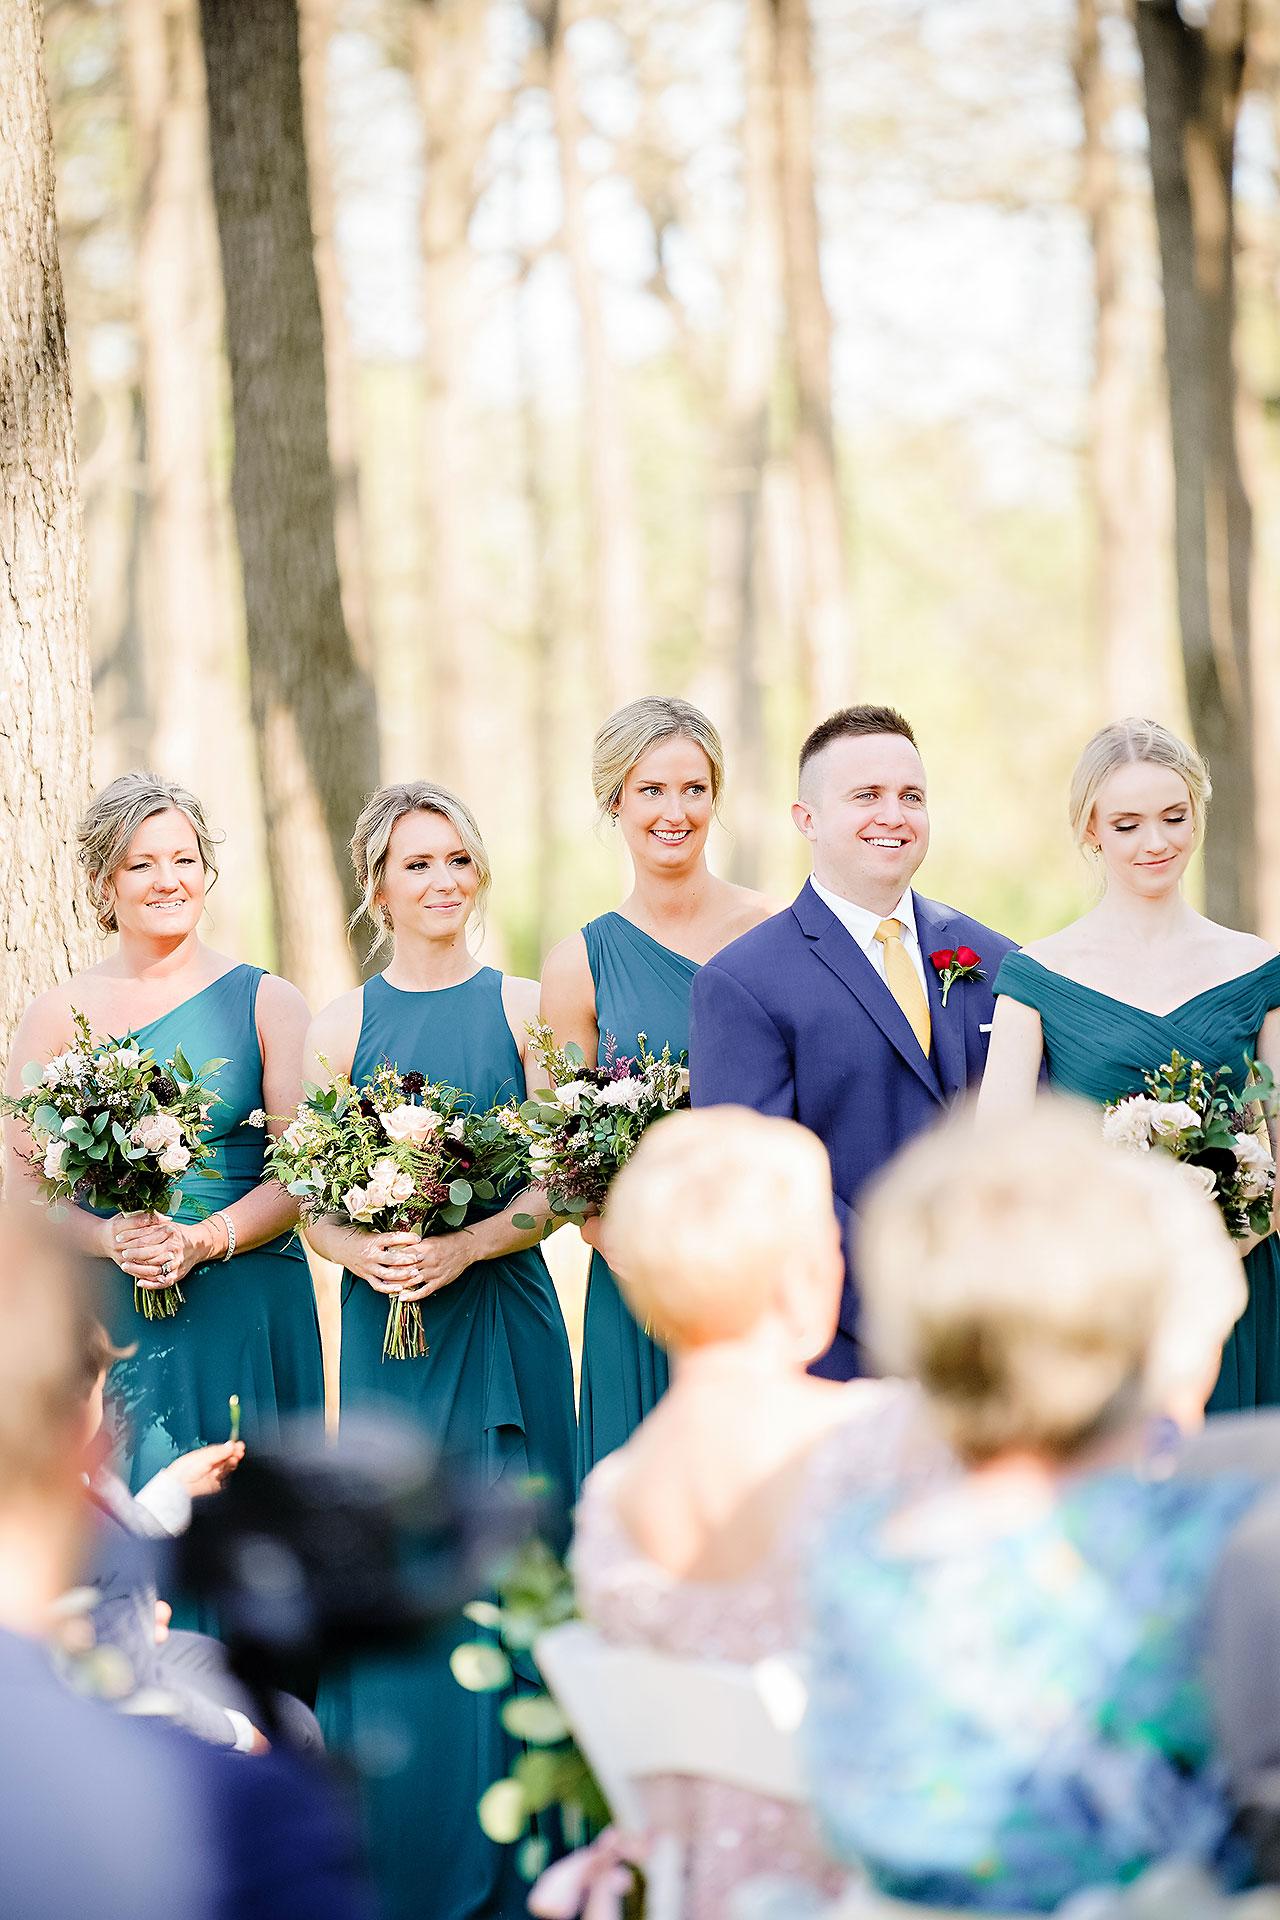 Nadia Parker Black Iris Estate Carmel Indiana Wedding May 2021 181